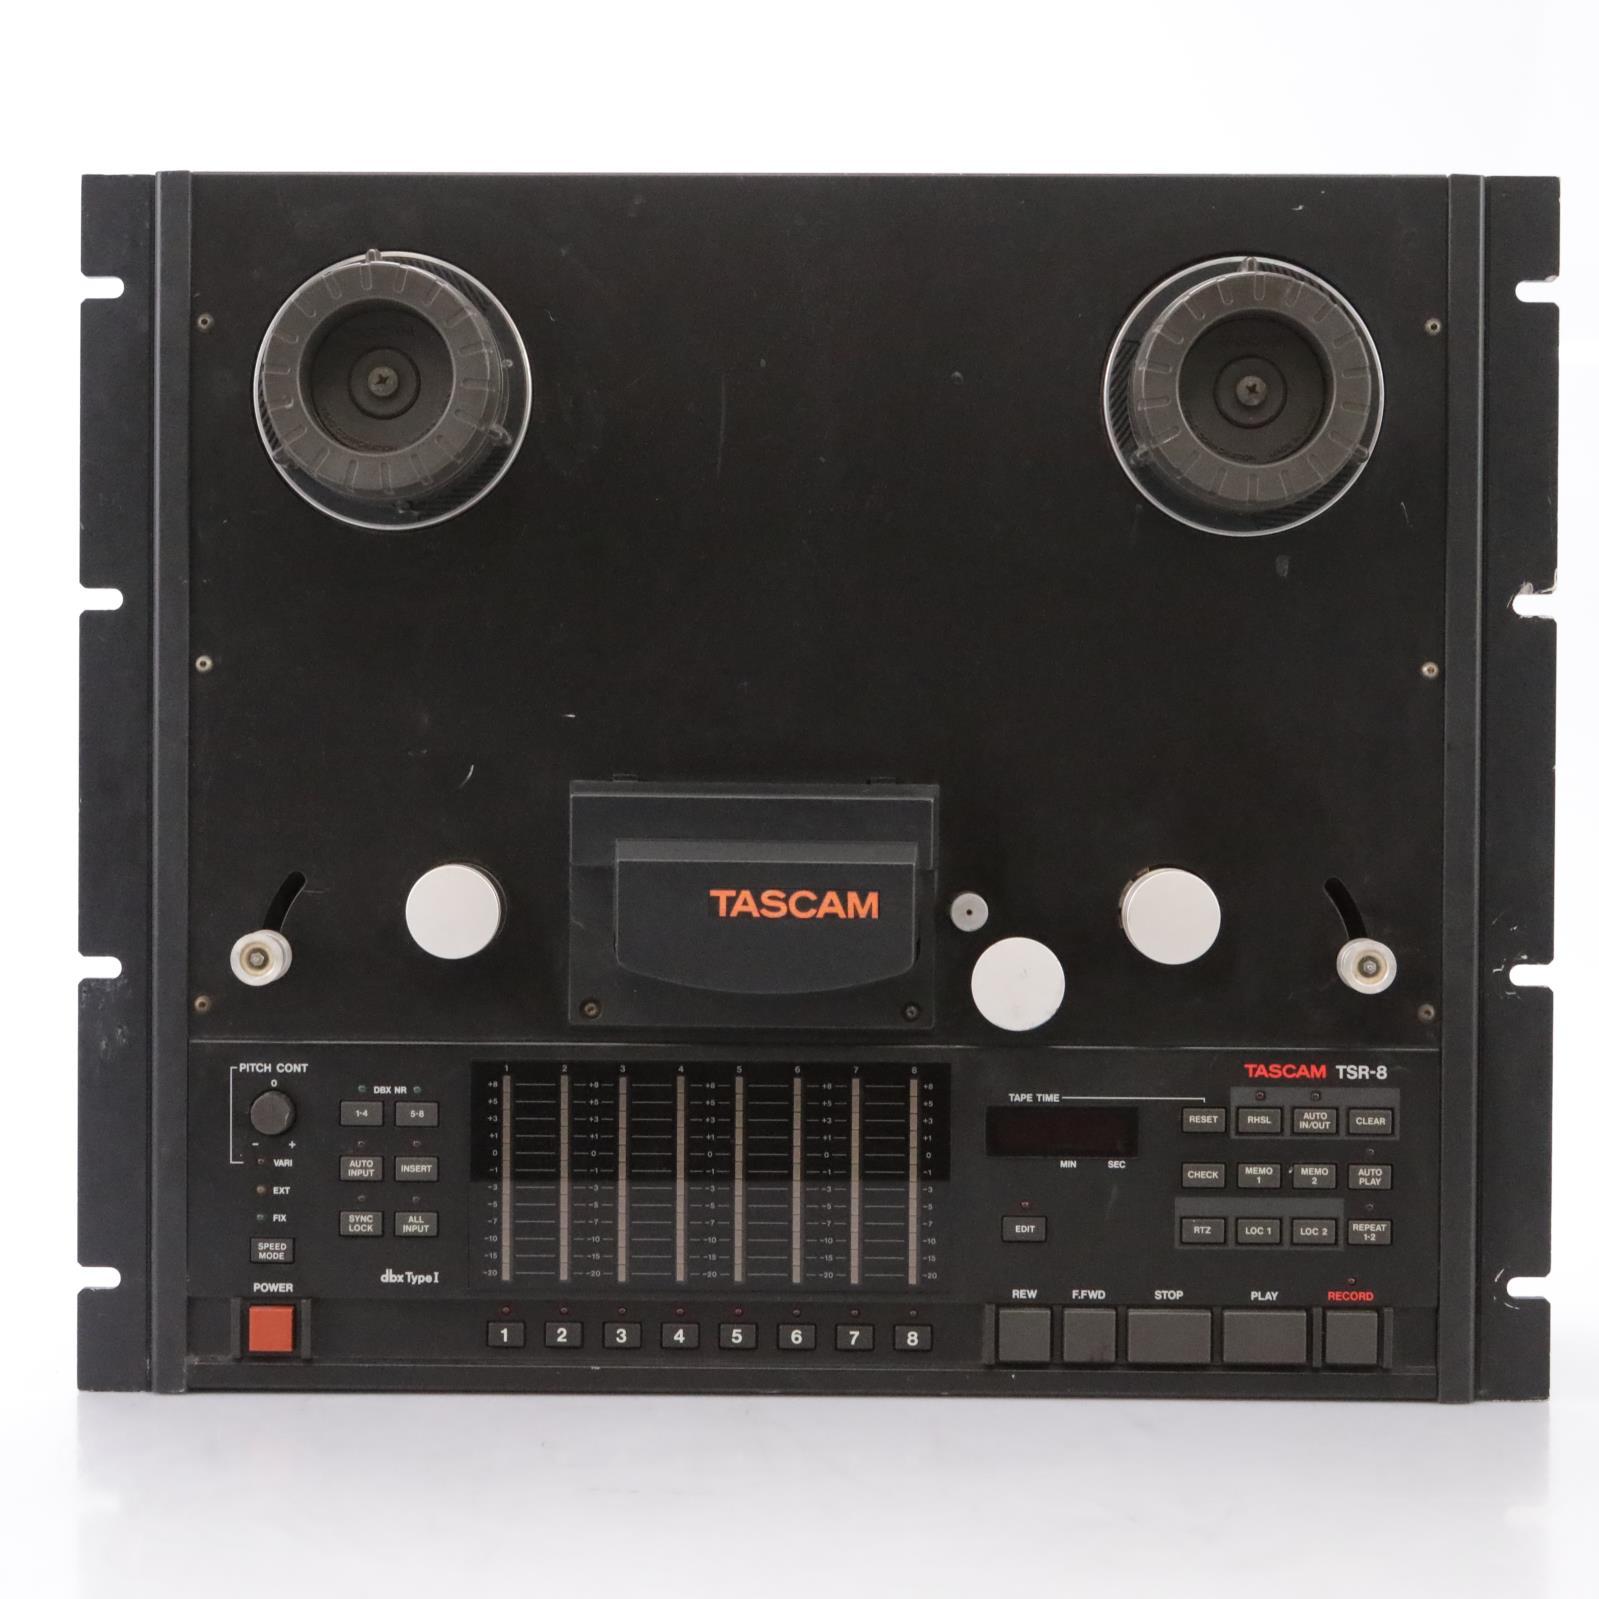 Tascam TSR-8 Reel-to-Reel Tape Recorder w/ 3M & Ampex 456 Reels #44197